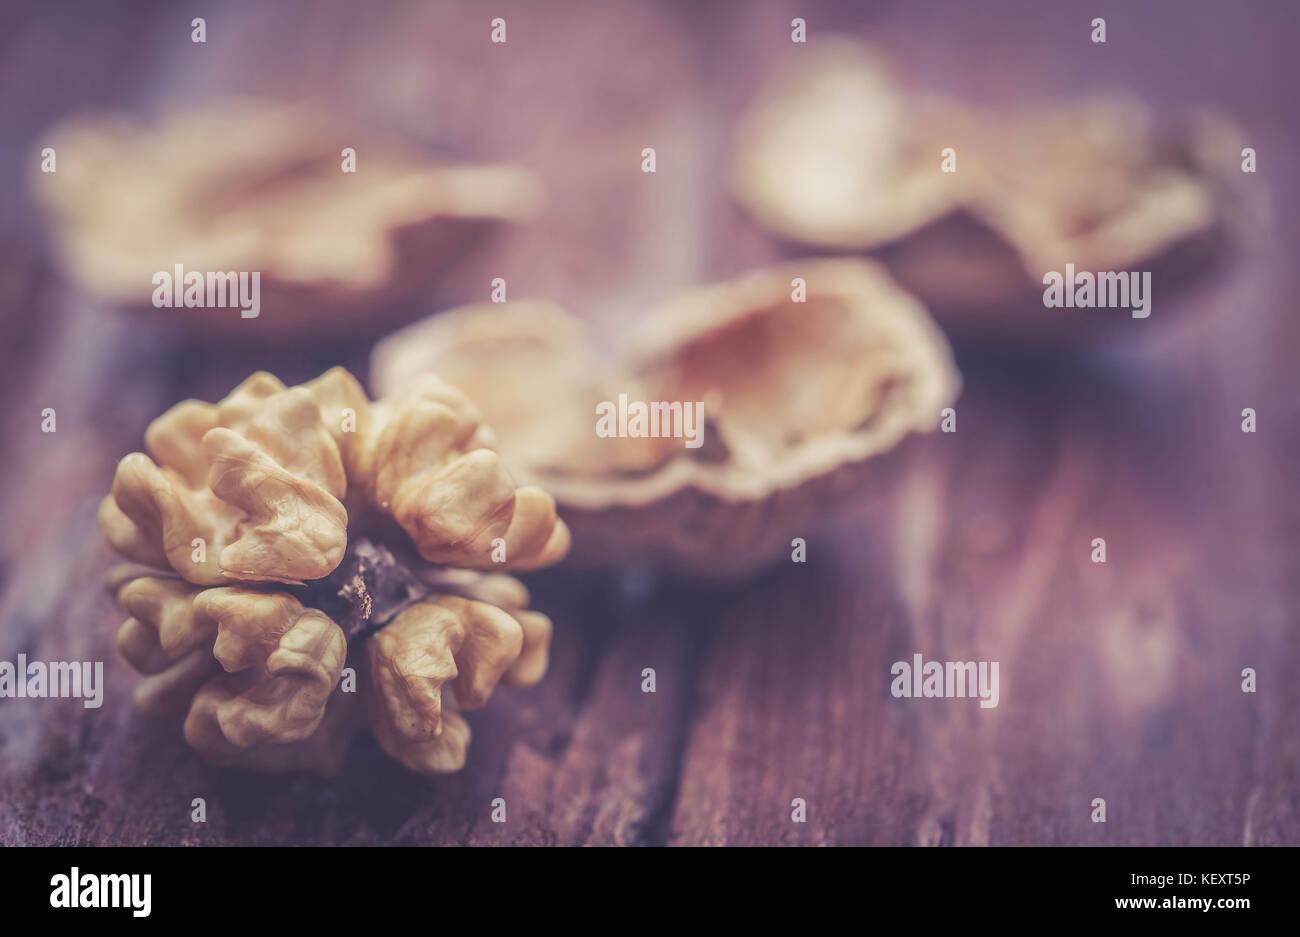 Walnut closeup on natural surface - Stock Image